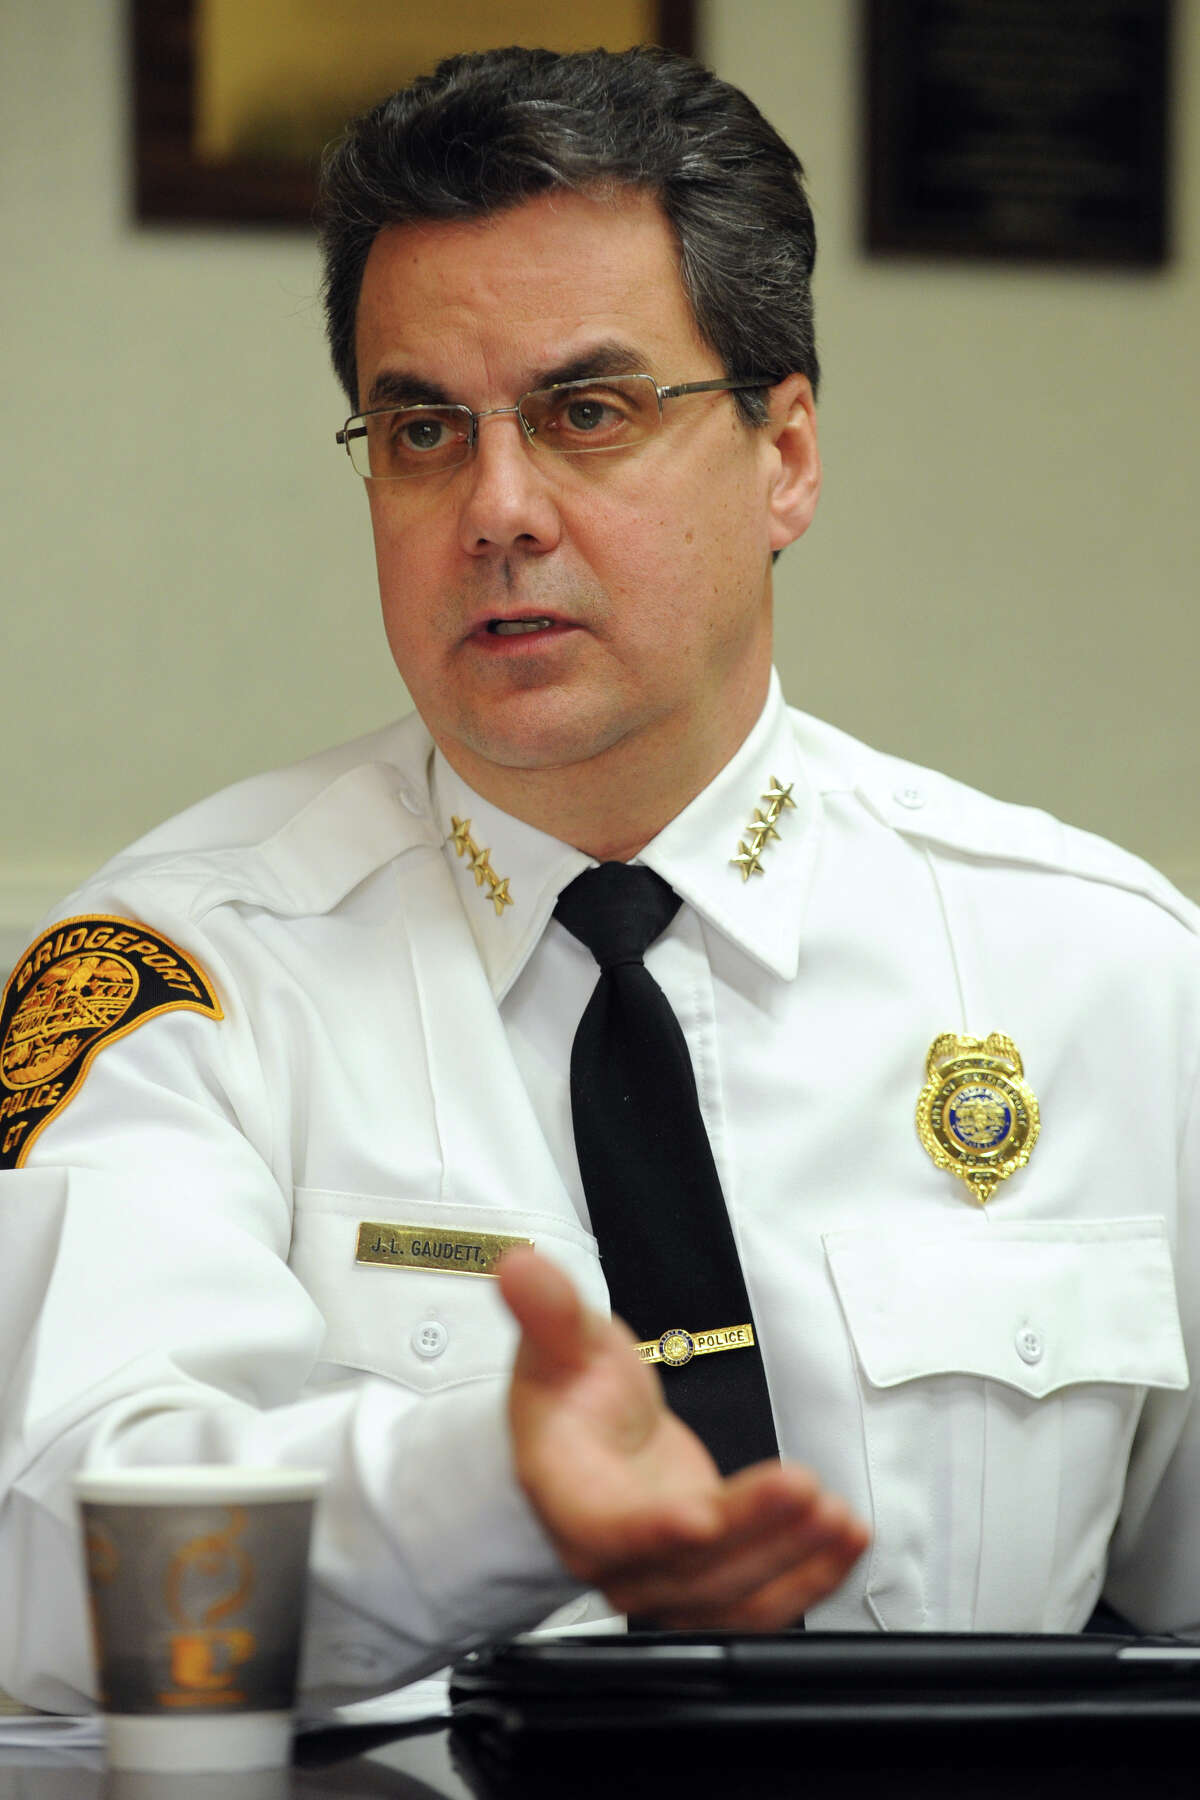 Bridgeport Police Chief Joseph Gaudett speaks during an interview in the Mayor's Office, in Bridgeport, Conn. Feb. 7th, 2013.